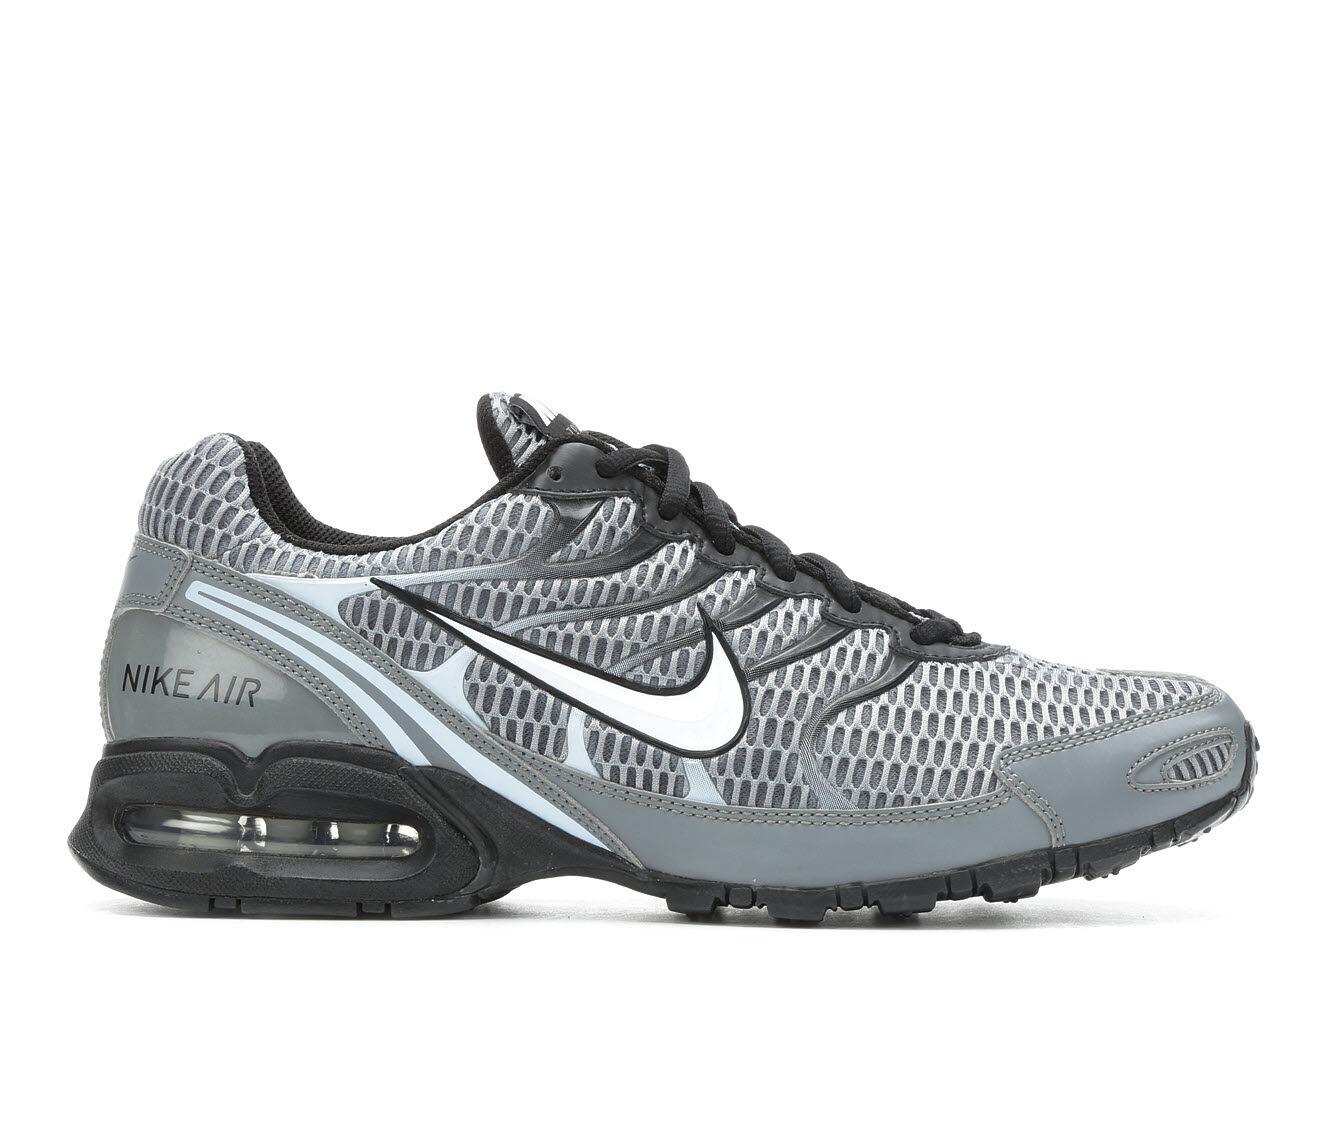 Men's Nike Air Max Torch 4 Running